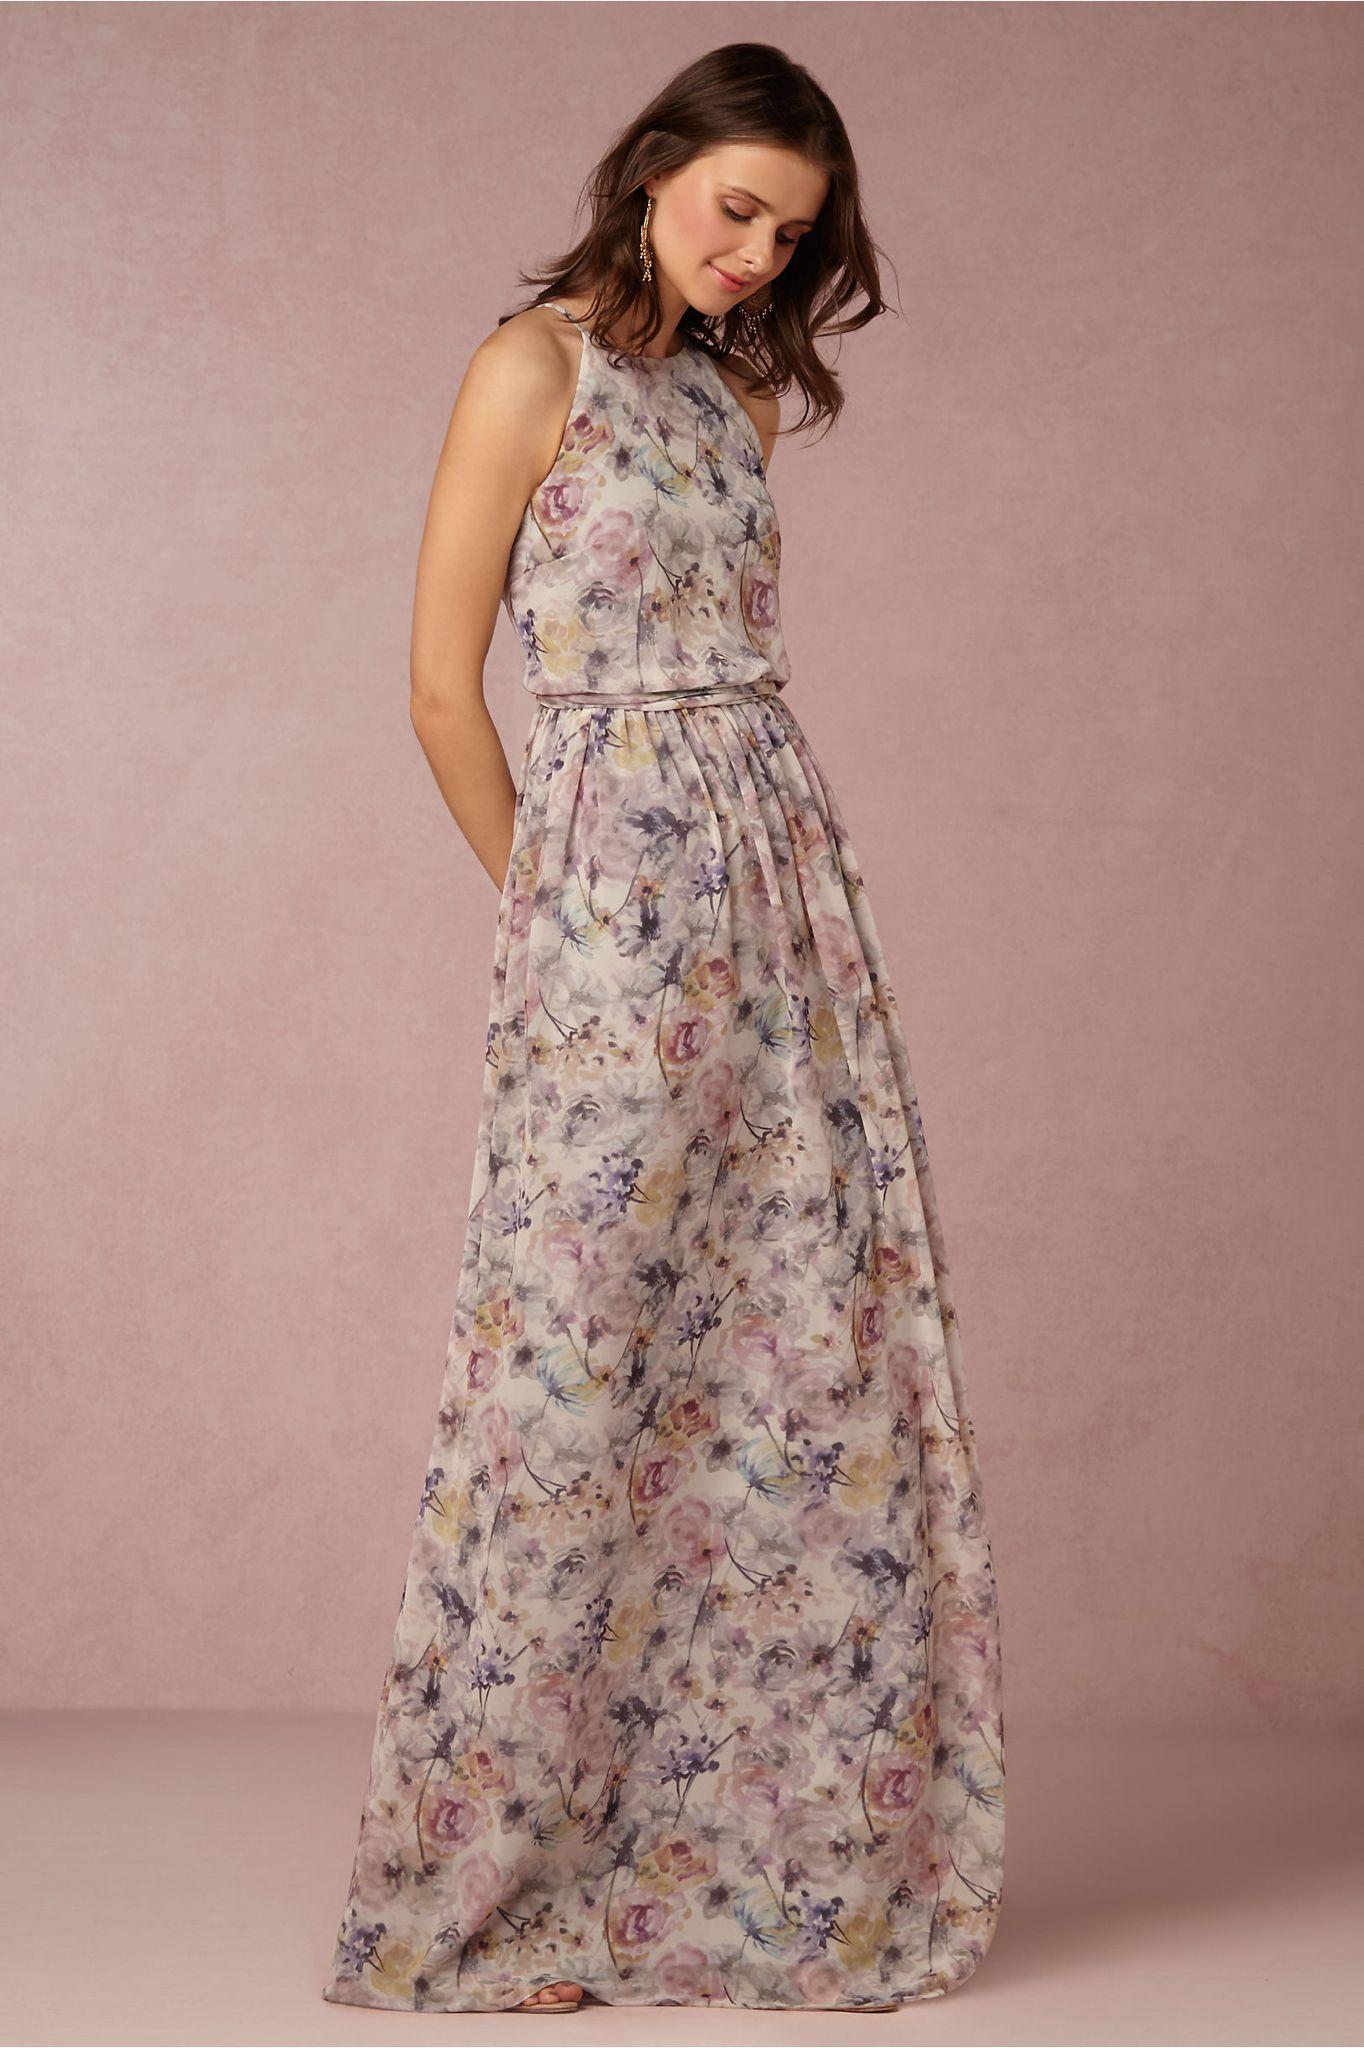 Vestido de noiva floral | แฟชั่น | Pinterest